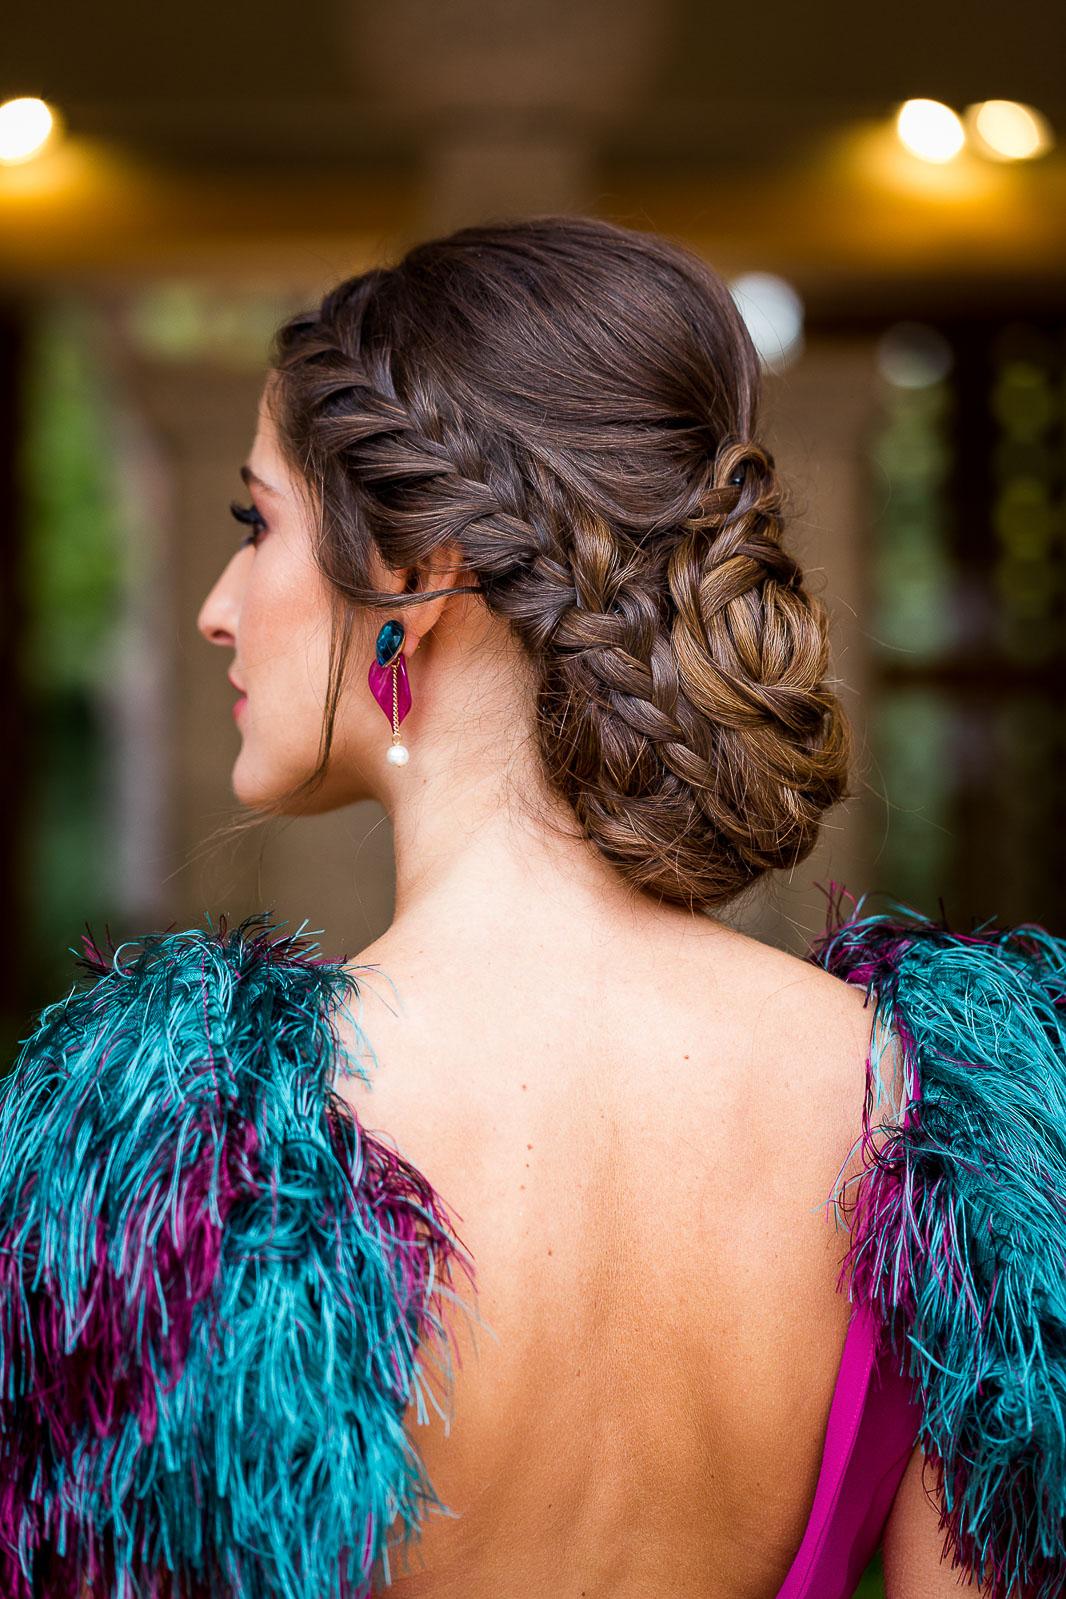 Peinado novia invitada trenza recogido bajo